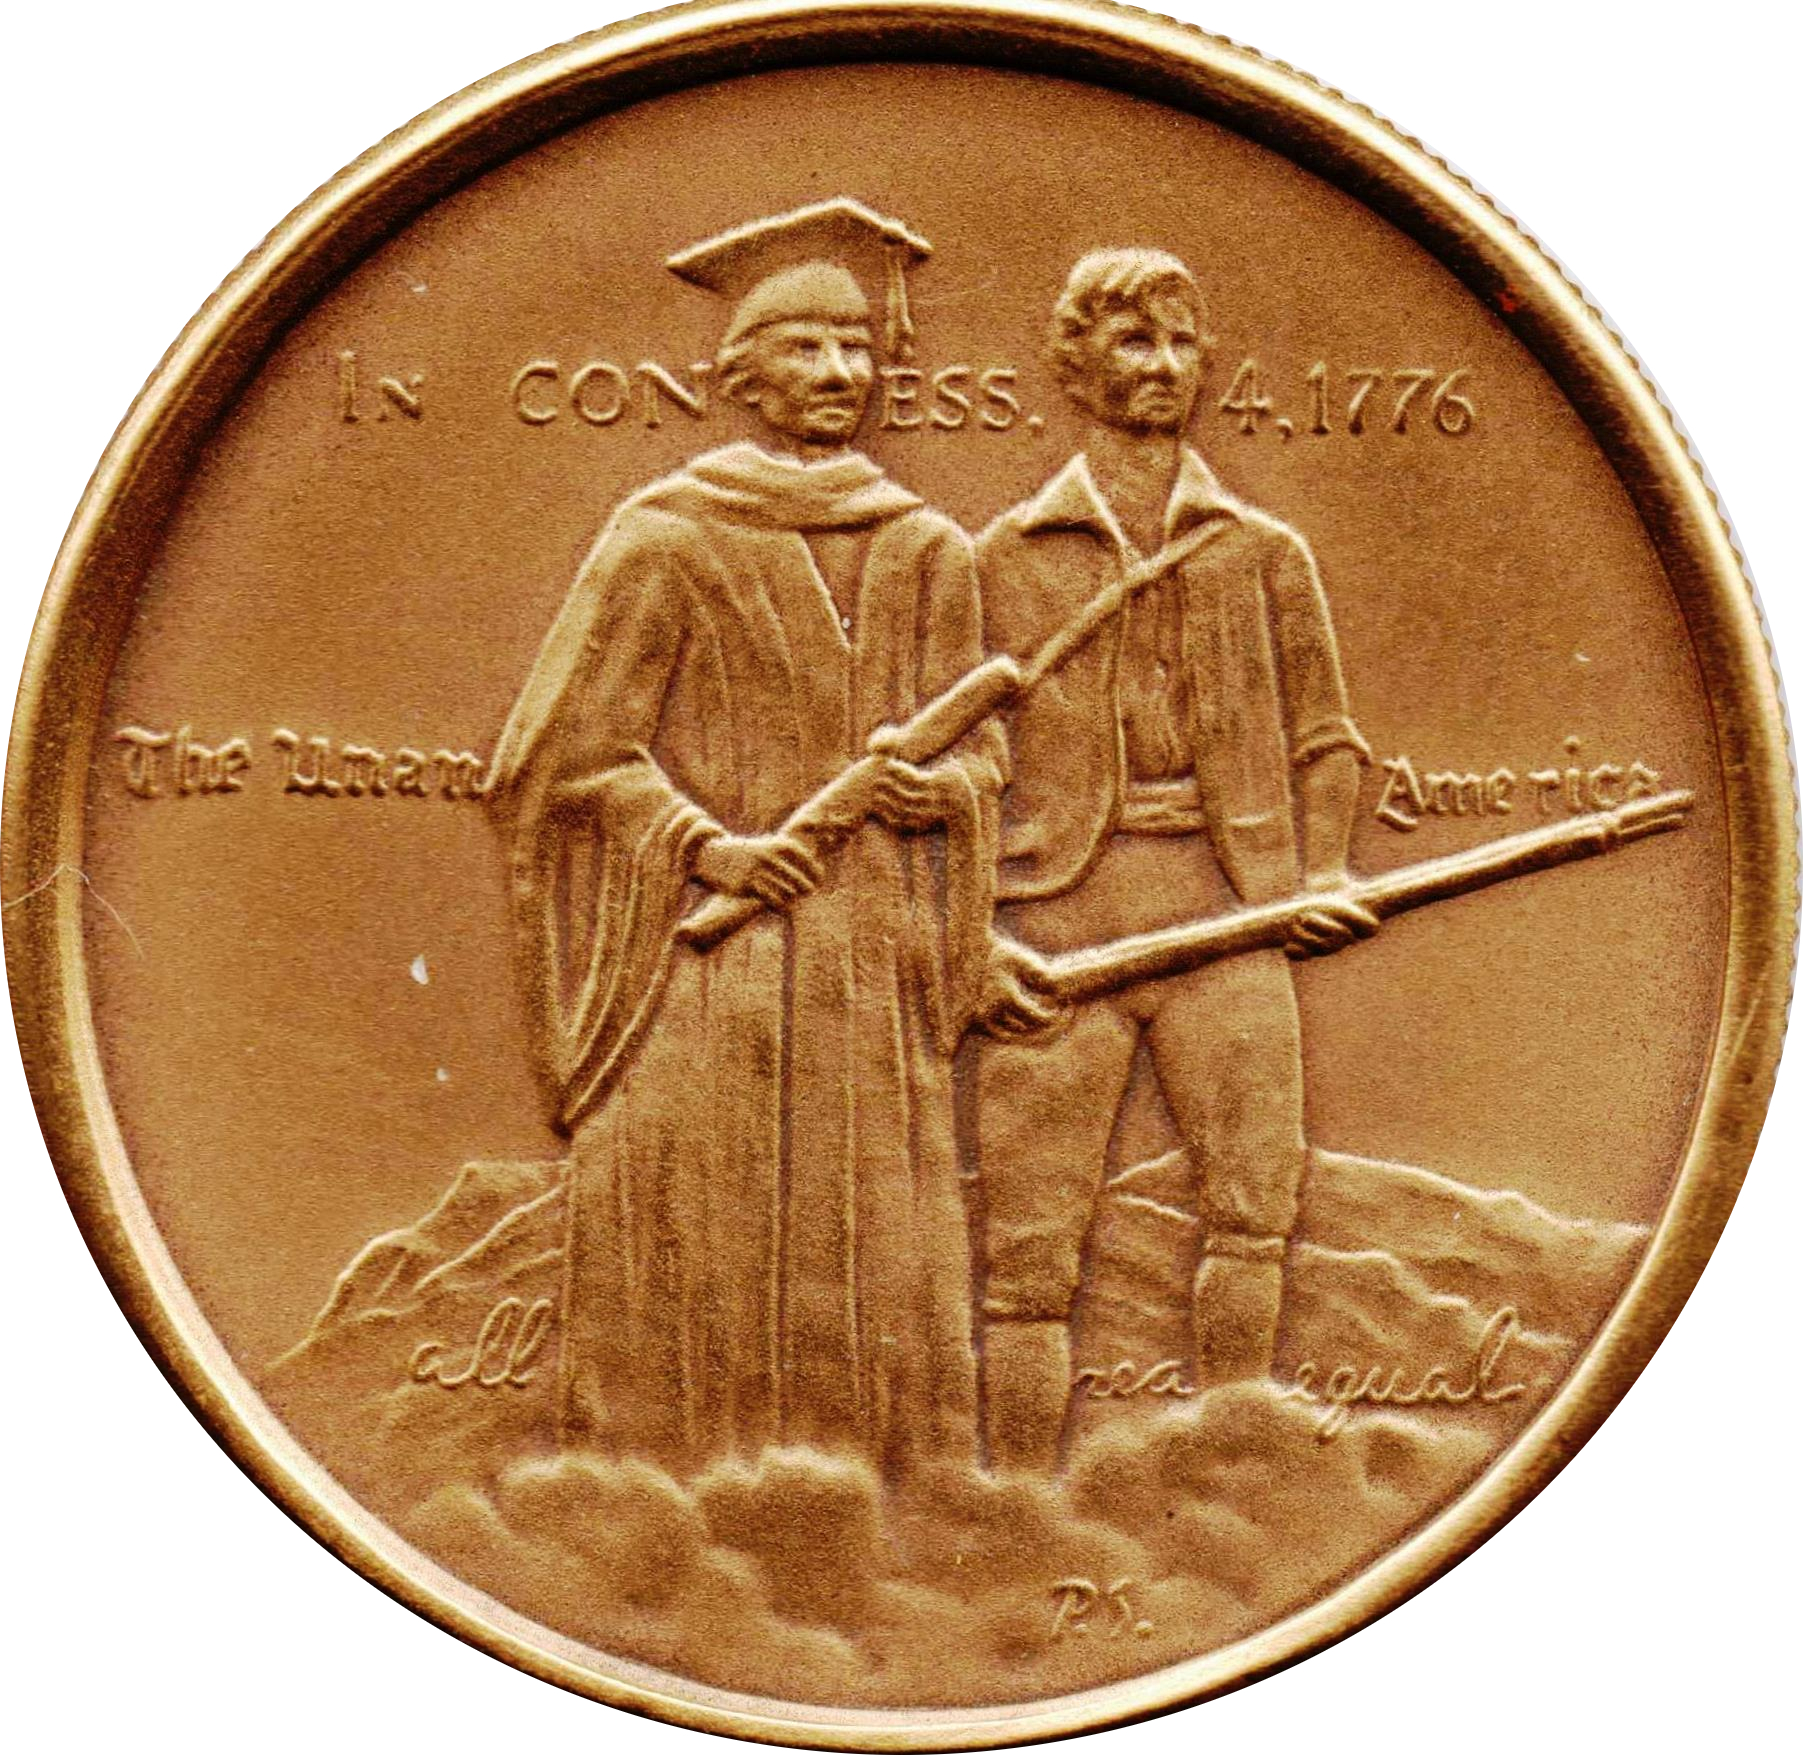 MASSACHUSETTS Official Sterling Silver Bicentennial PROOF Medal